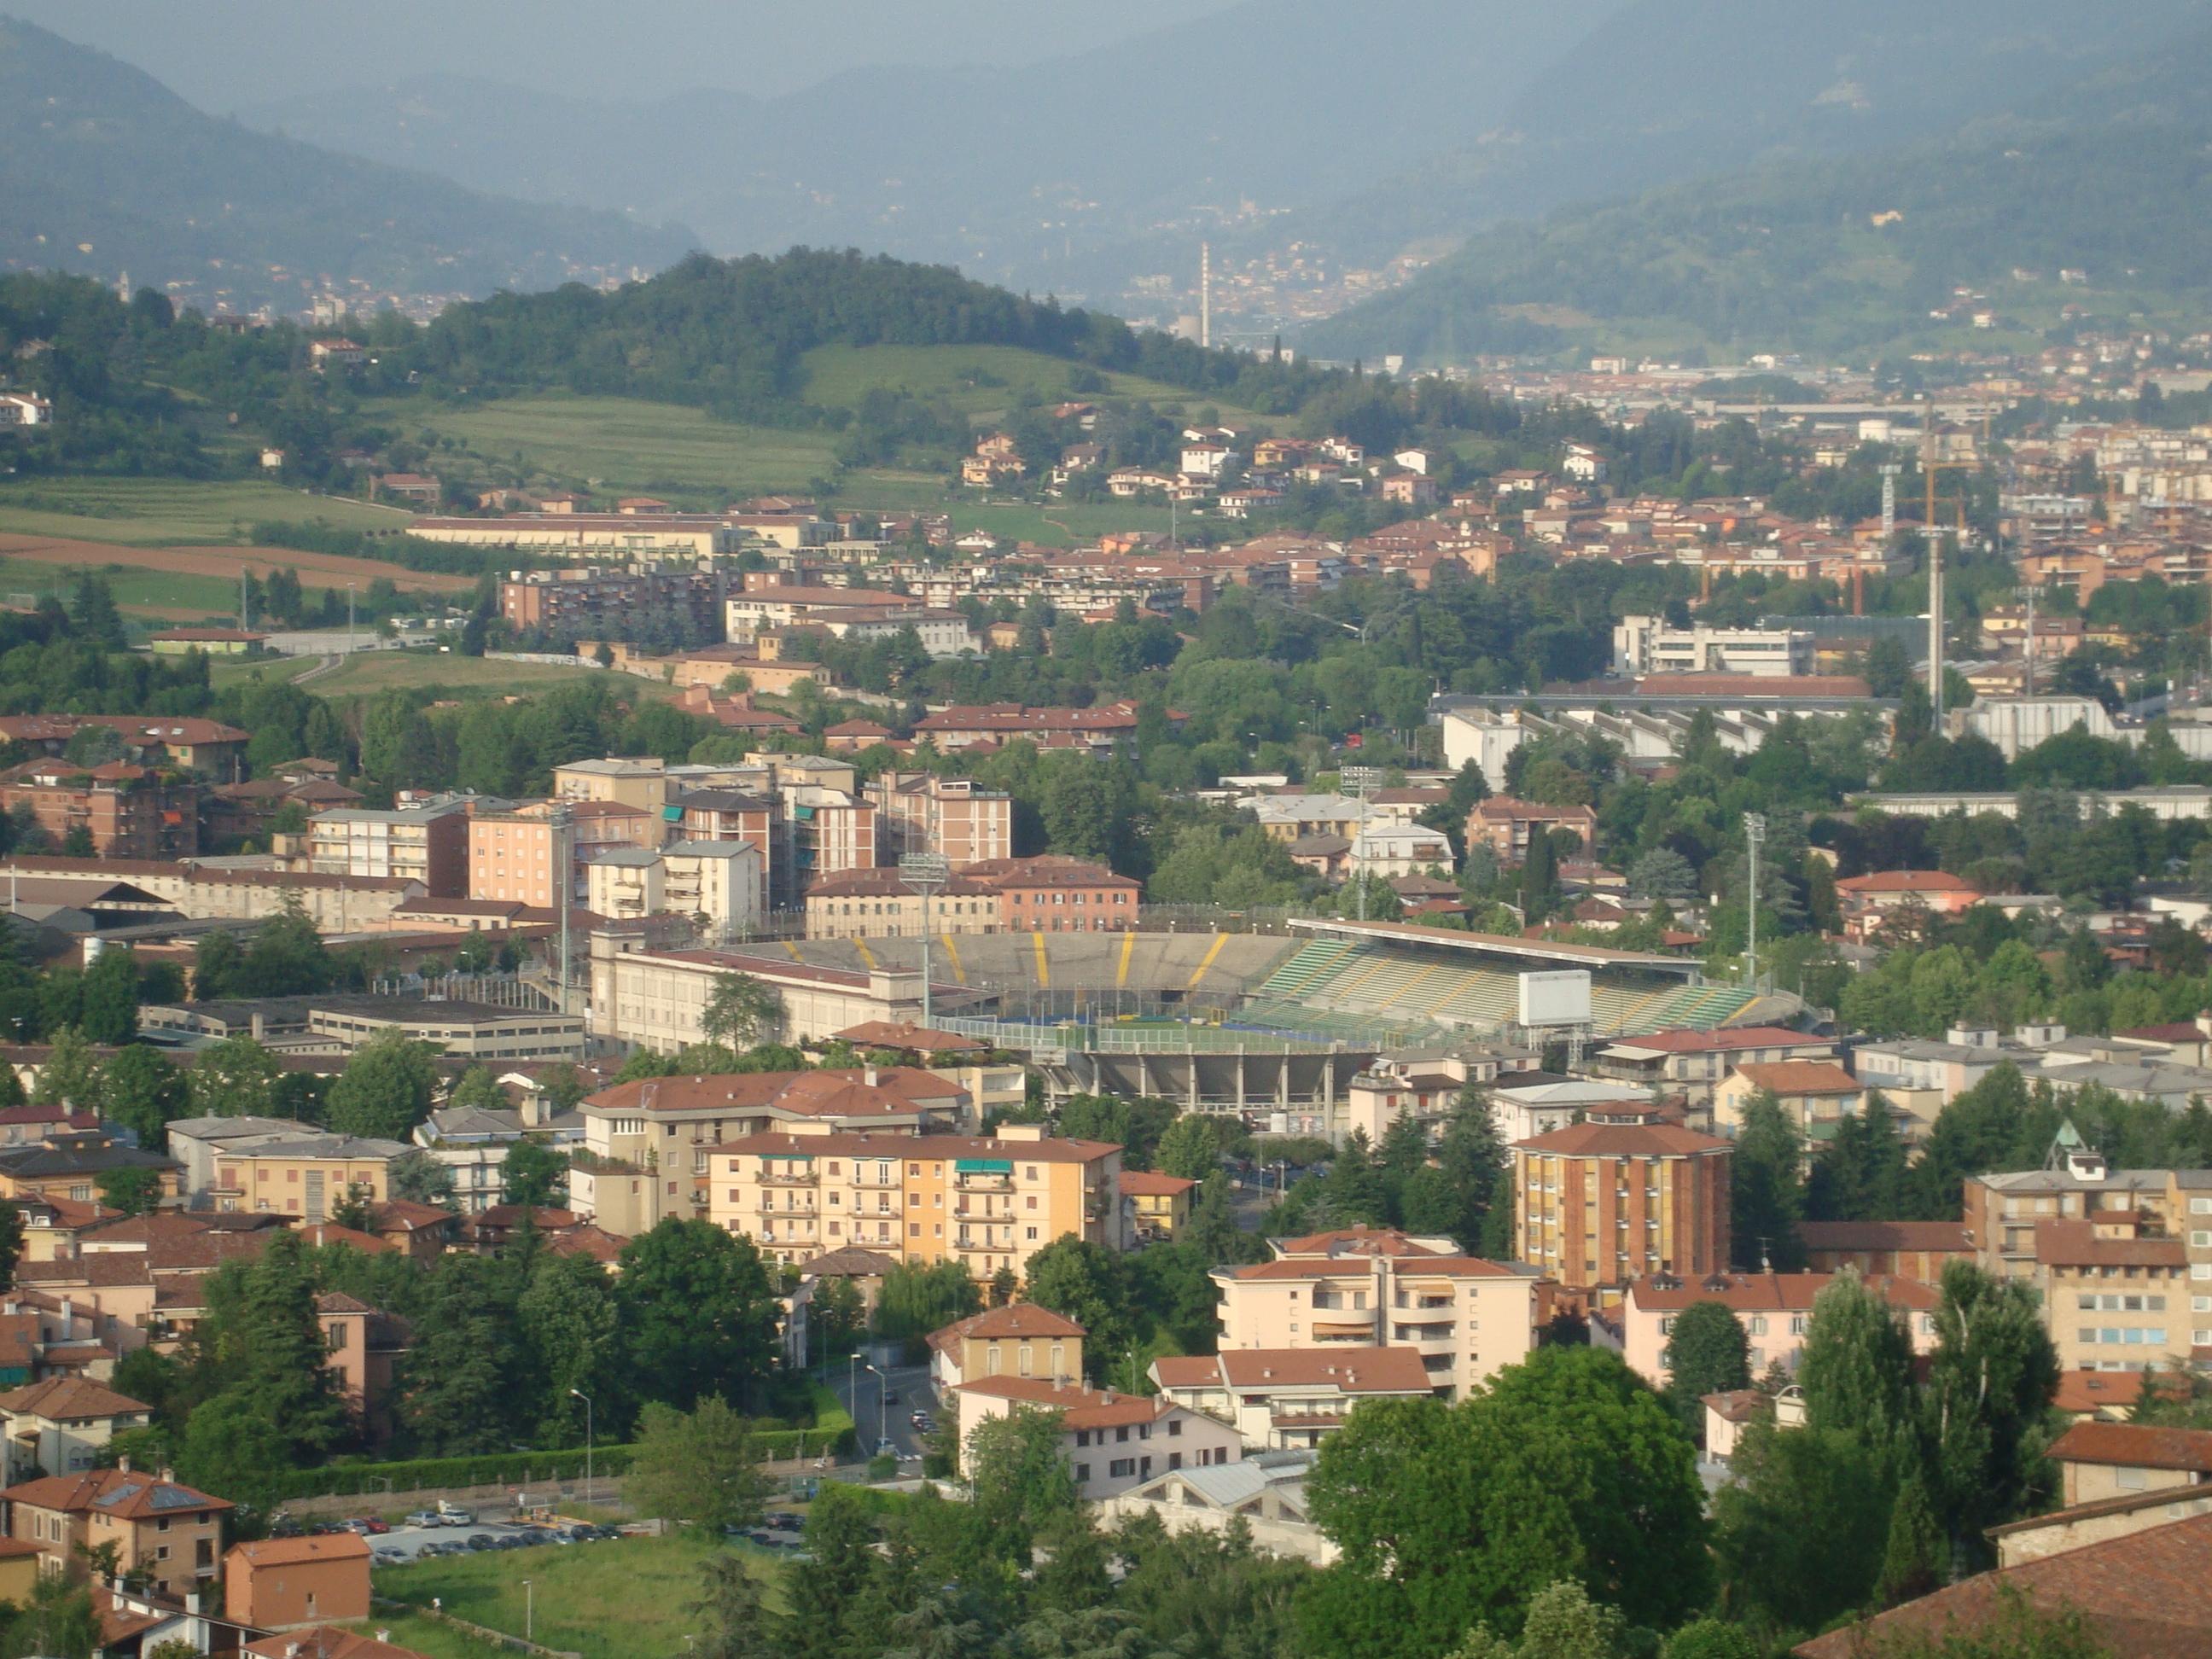 Stadion Bergamo